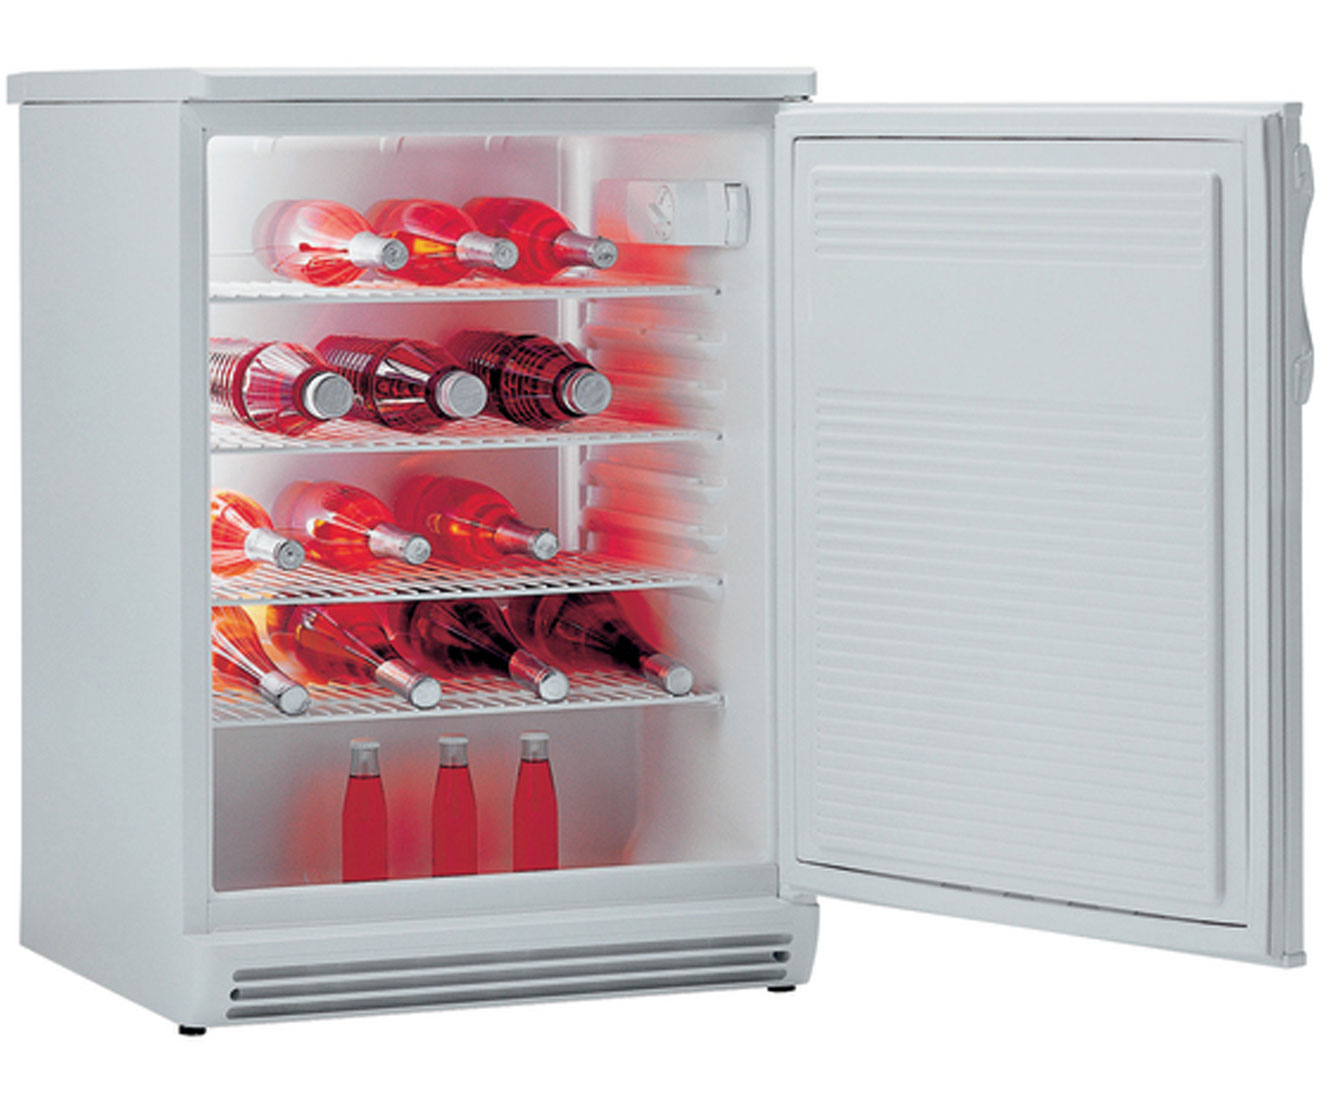 Gorenje Kühlschrank R 6192 Fw : Rabatt preisvergleich.de küche u003e kühlen gefrieren u003e kühlschränke